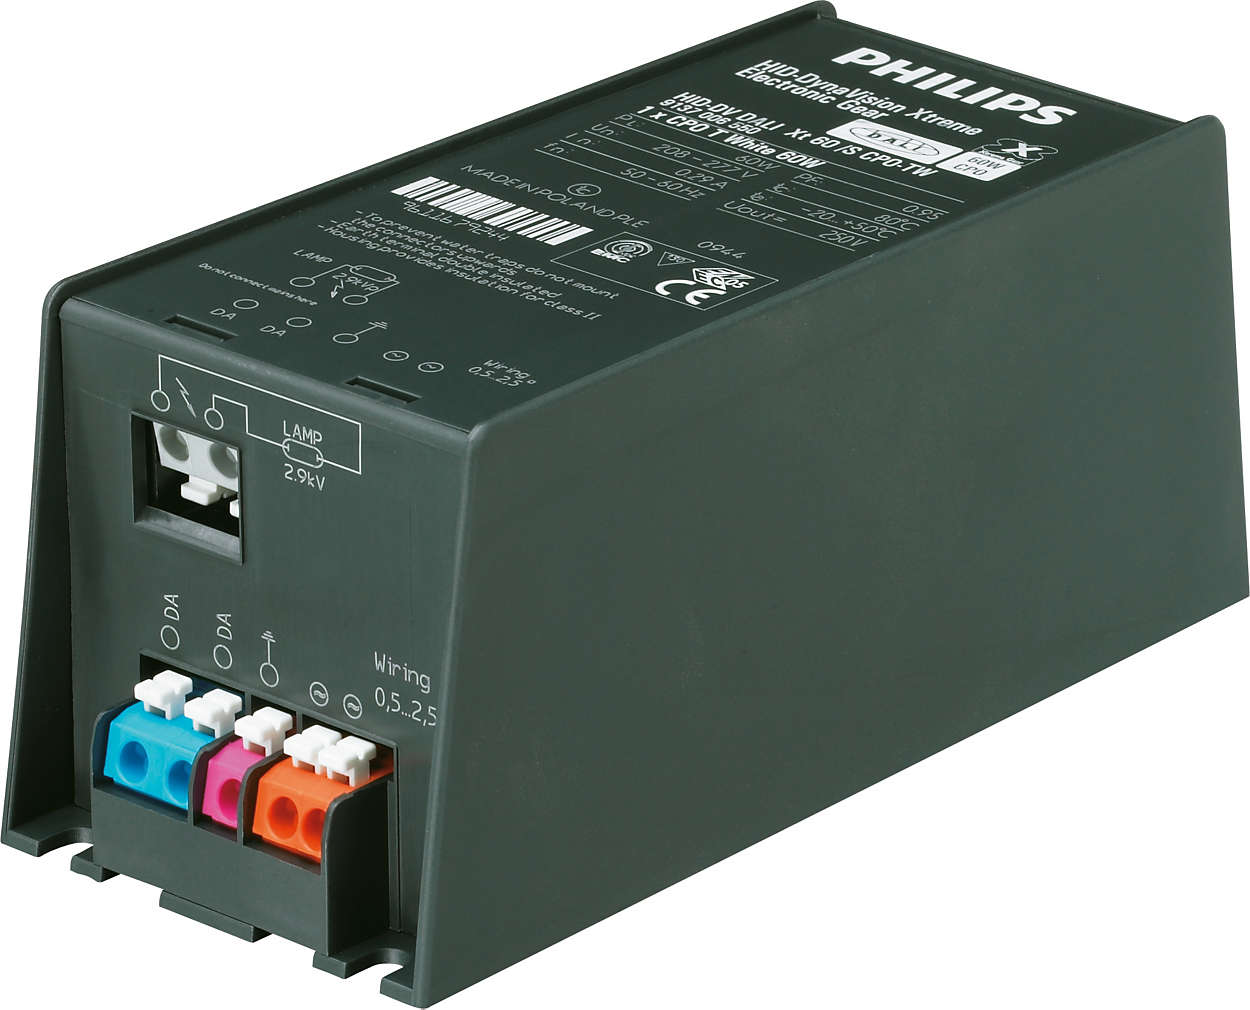 Xtreme drivers for maximum energy savings